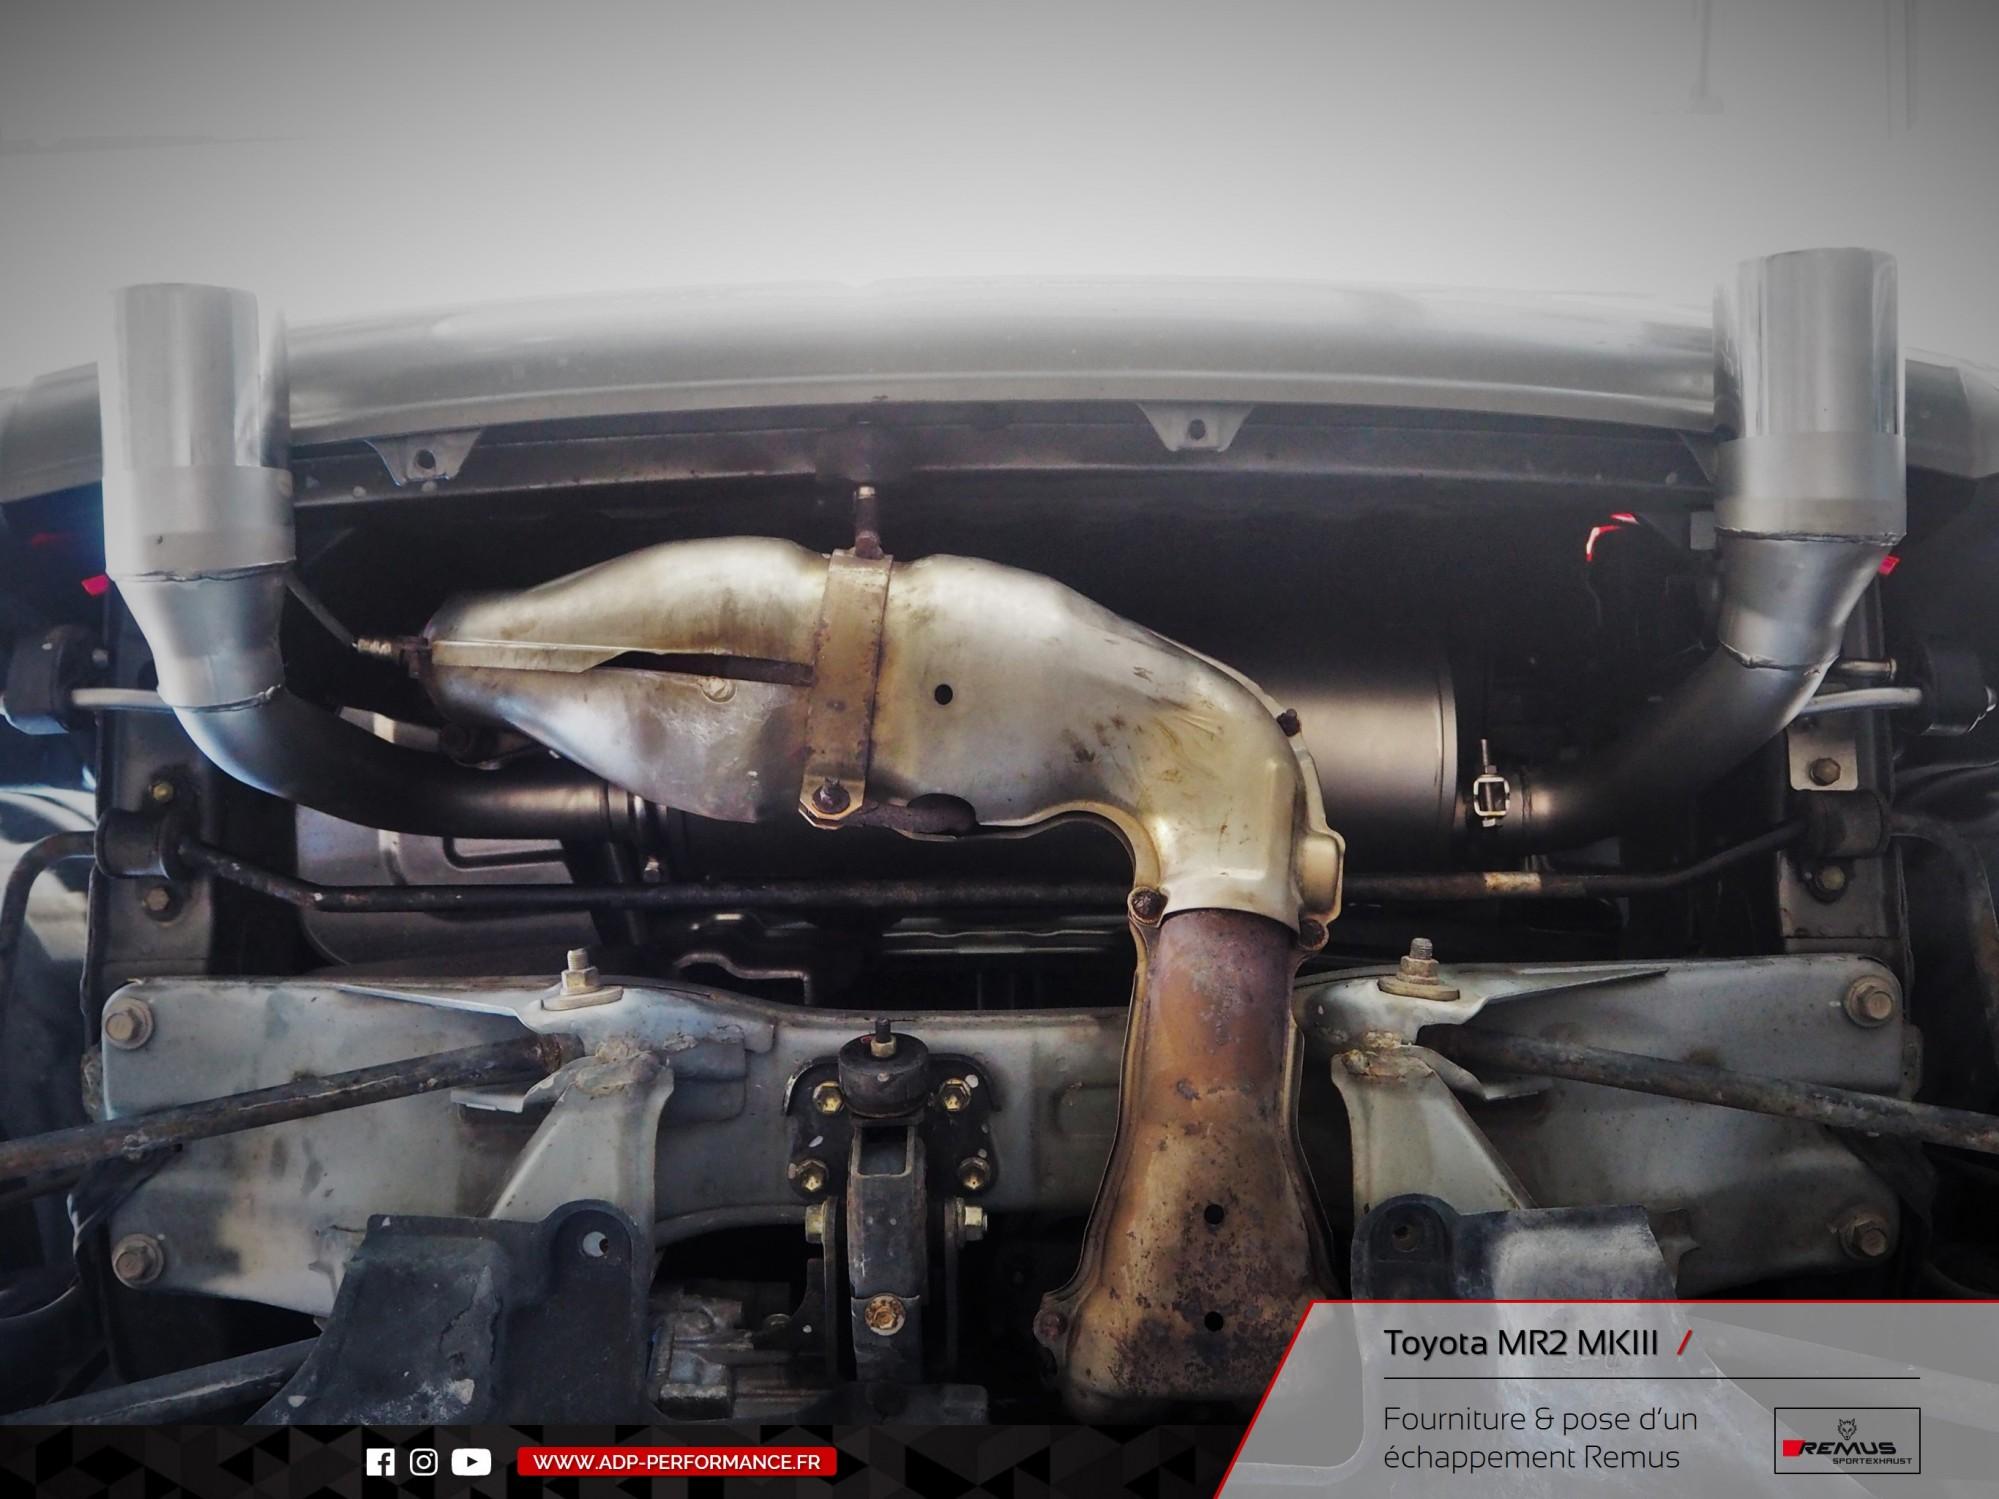 Ligne d'échappement Remus Marseille - Toyota MR2 MK3 - ADP Performance